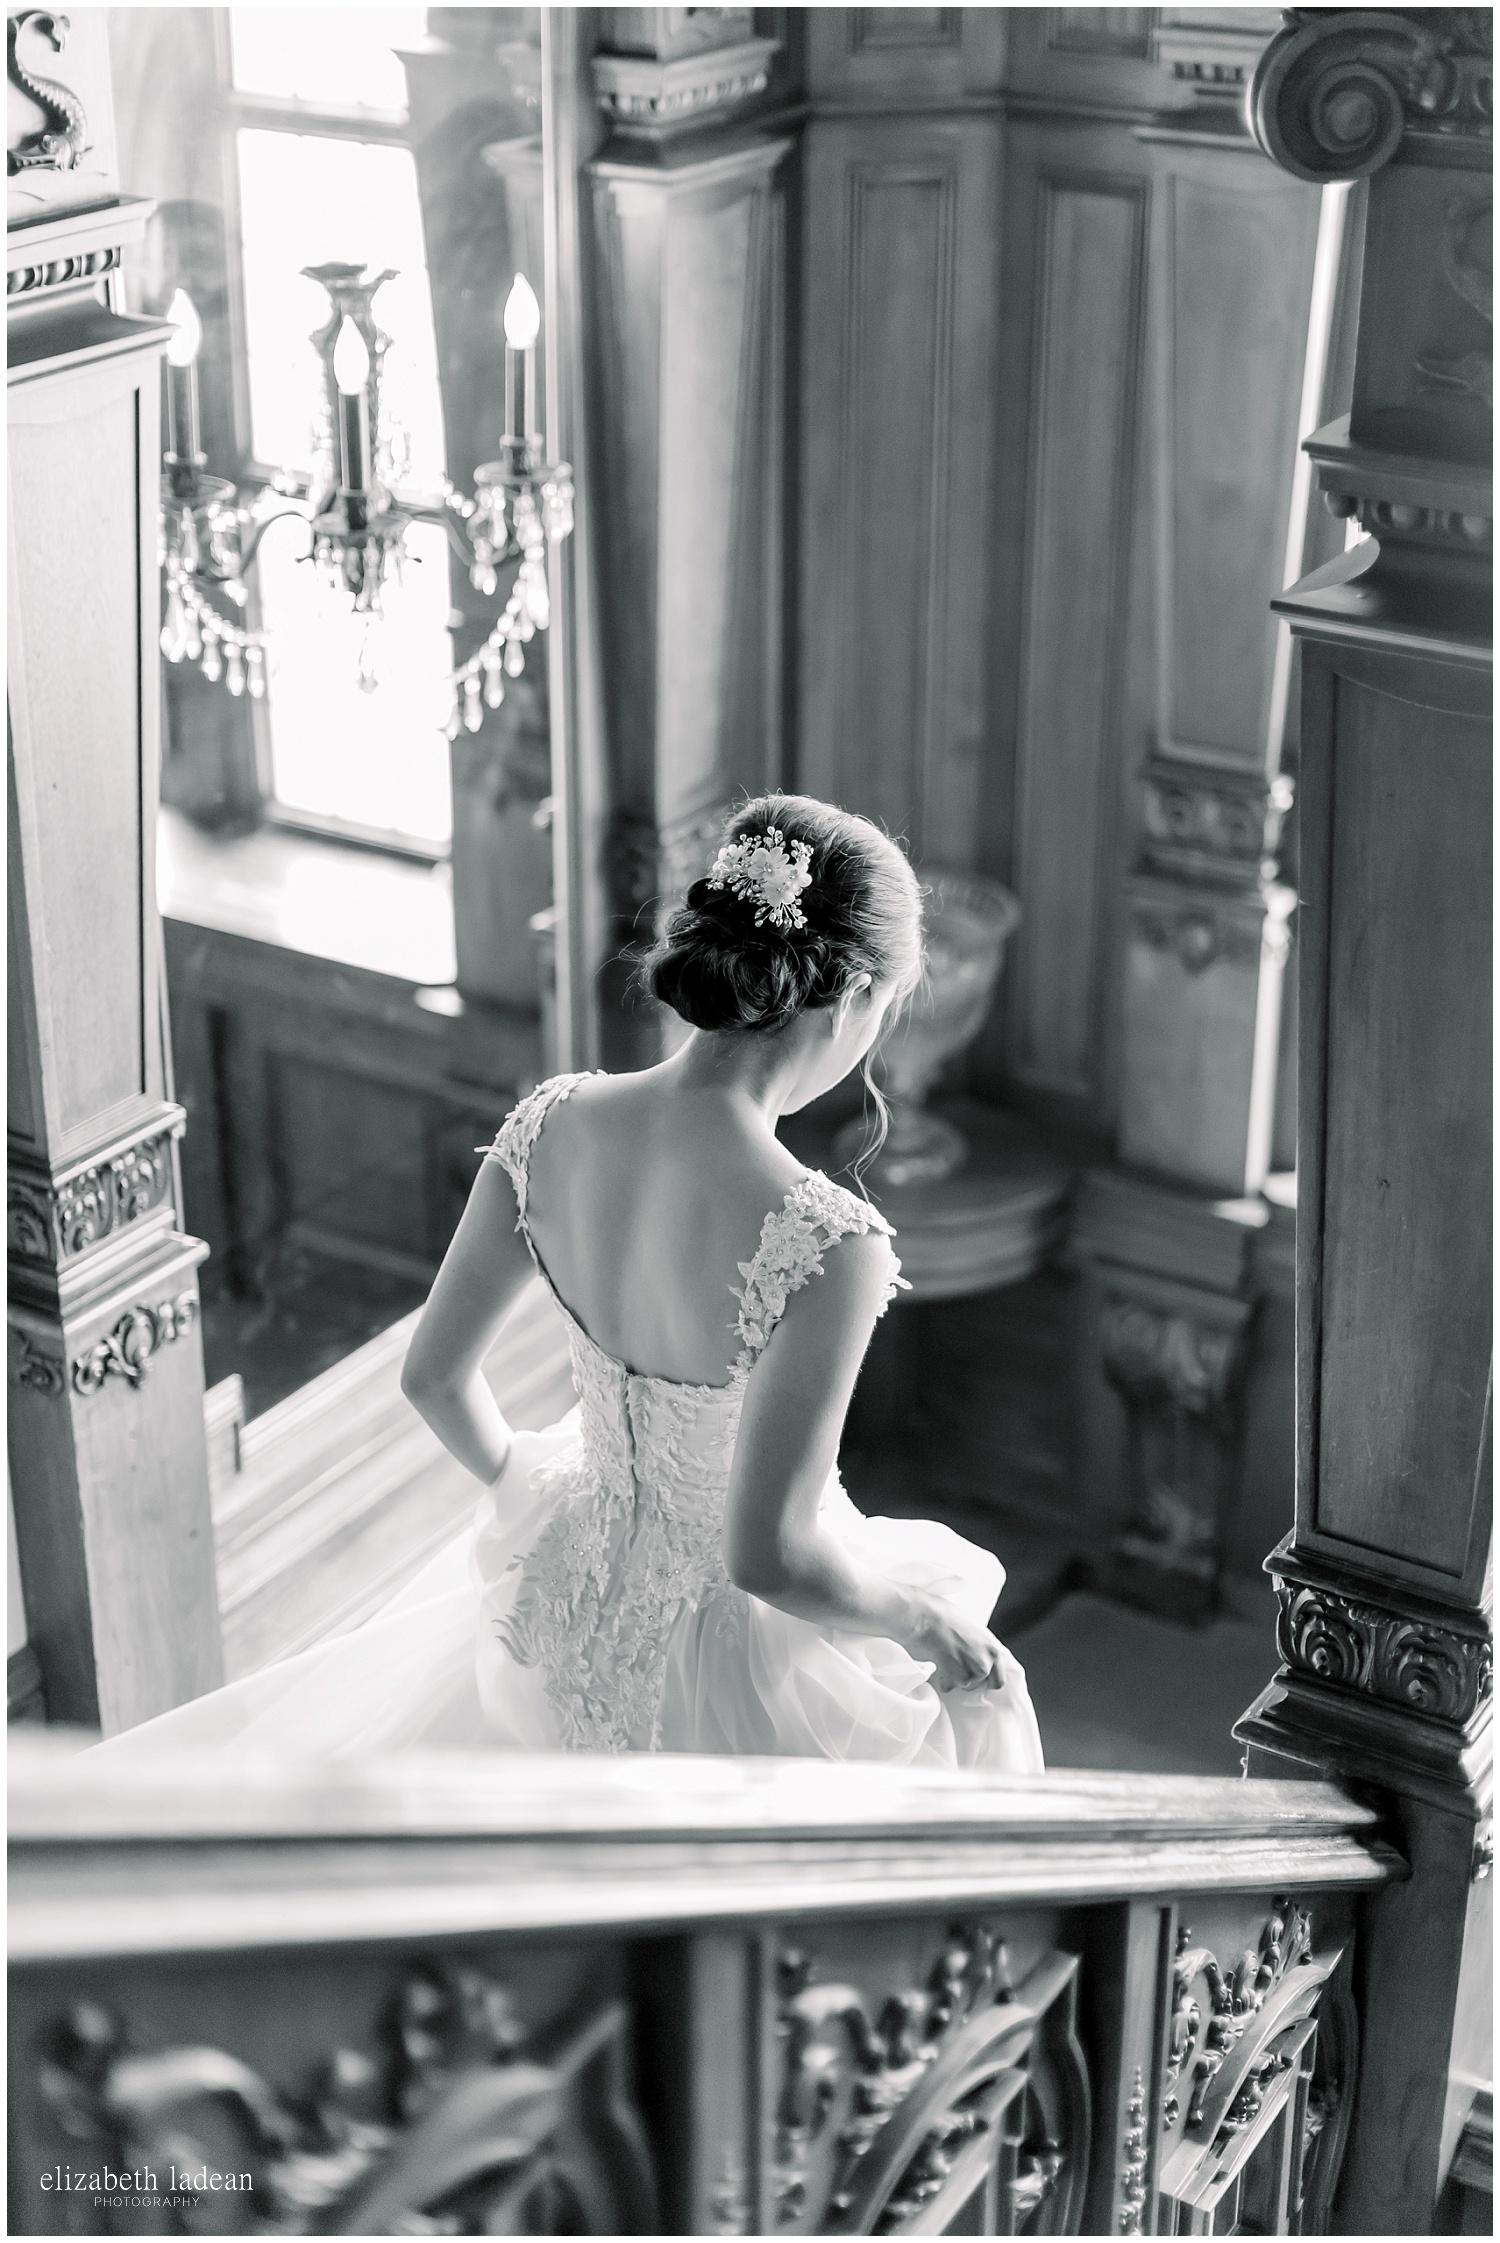 -Adventurous-Kansas-City-Worldwide-Wedding-Photographer-2018-elizabeth-ladean-photography-photo_3165.jpg